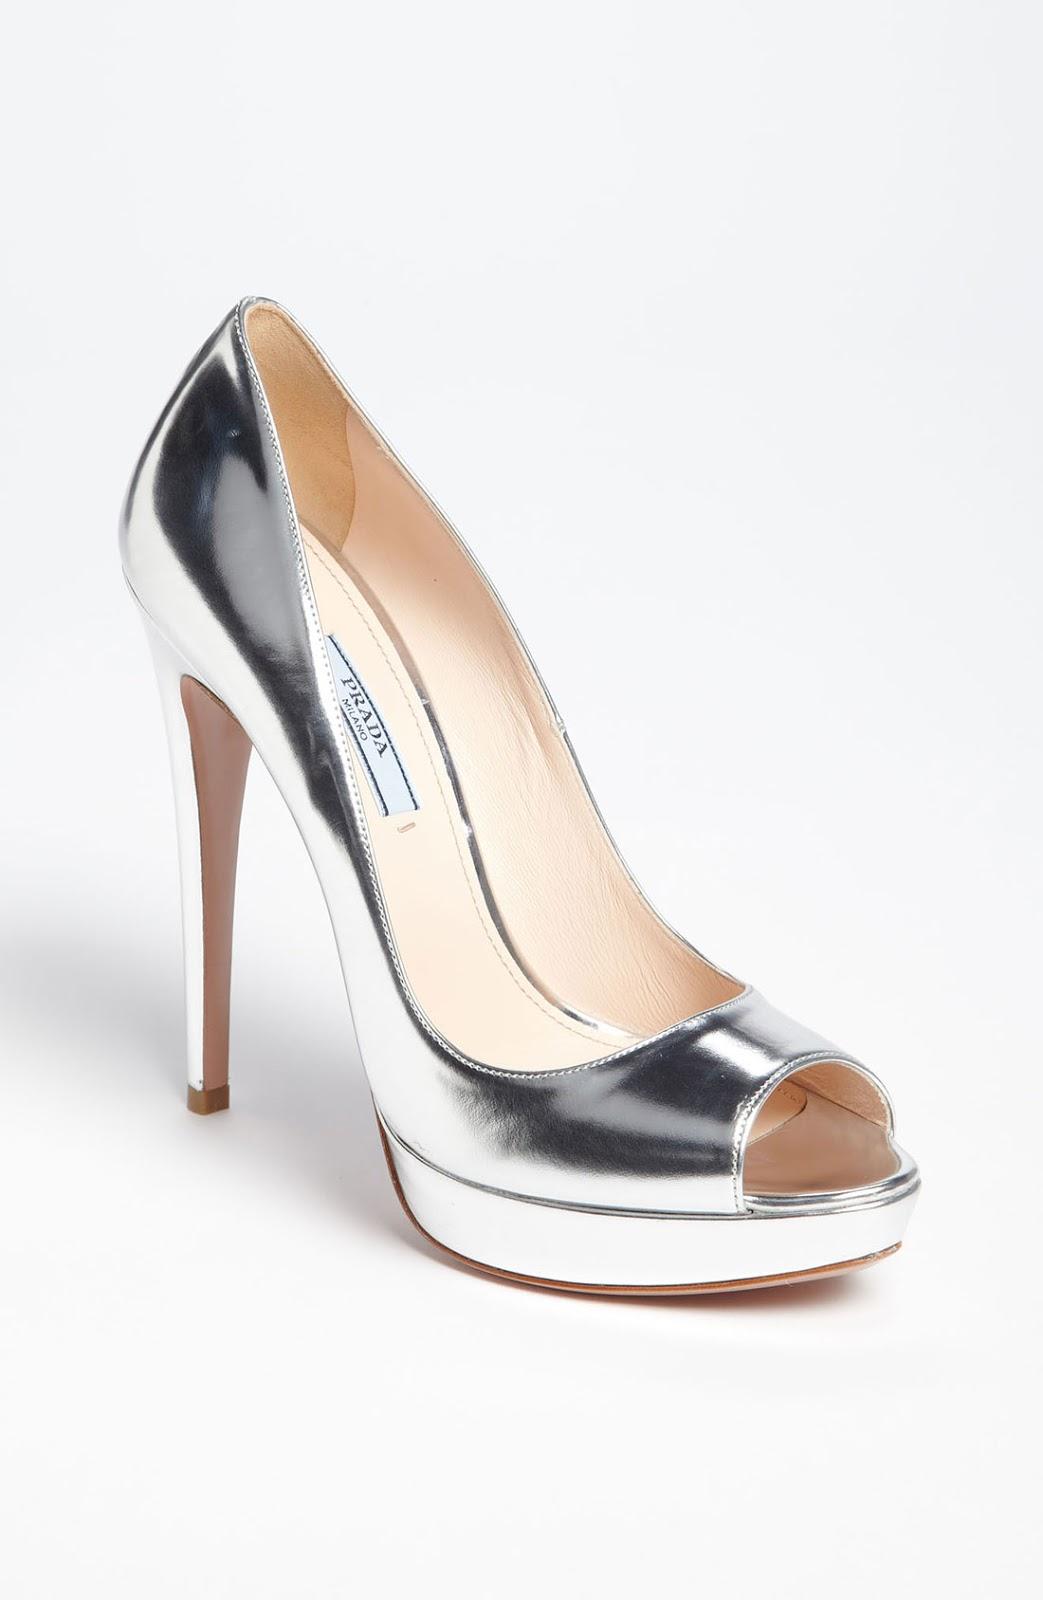 97bed9f6be6 Zapatos plateados de noche ¡11 Ideas de Calzado!   Zapatos, Botas ...